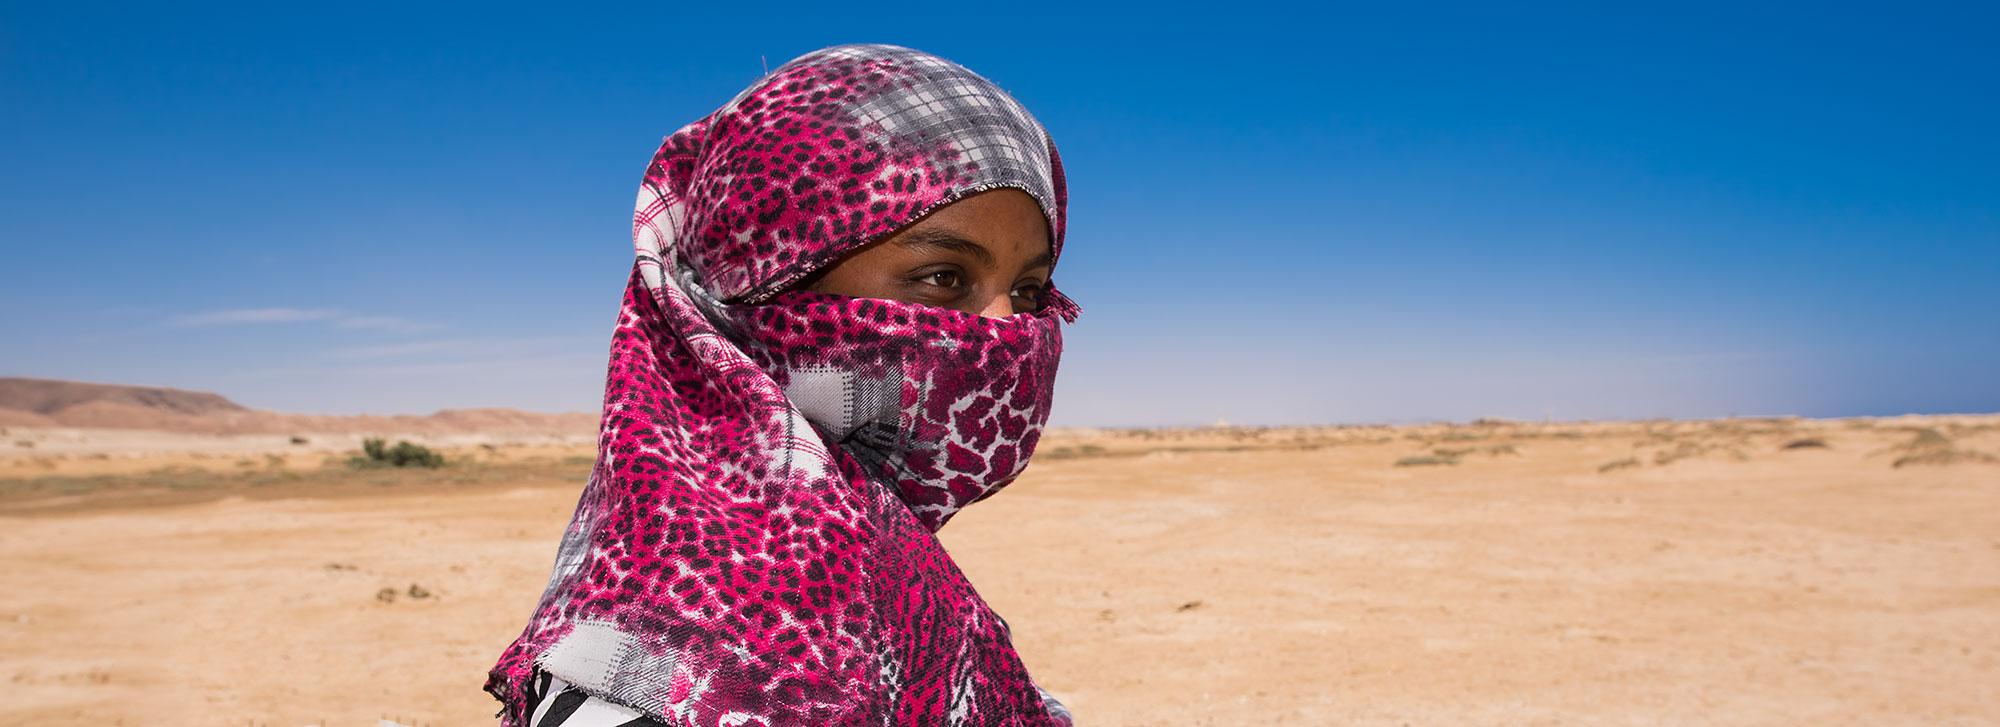 Egyptian Beduin Woman at ras Abu Ghusun, Red Sea